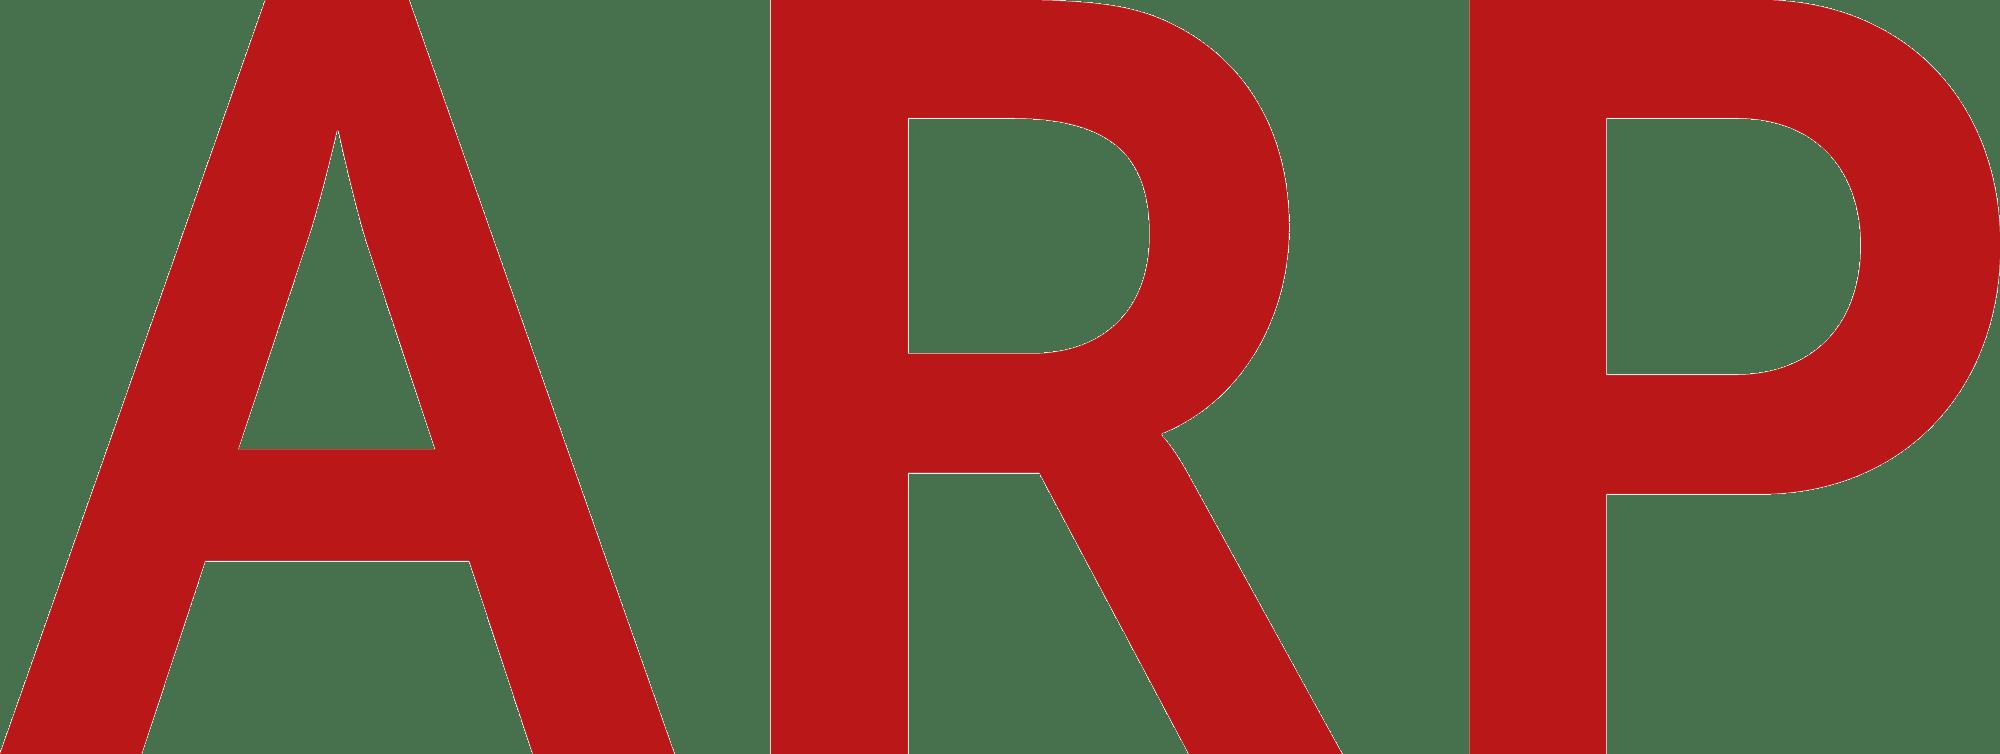 Stiftung Arp e.V.